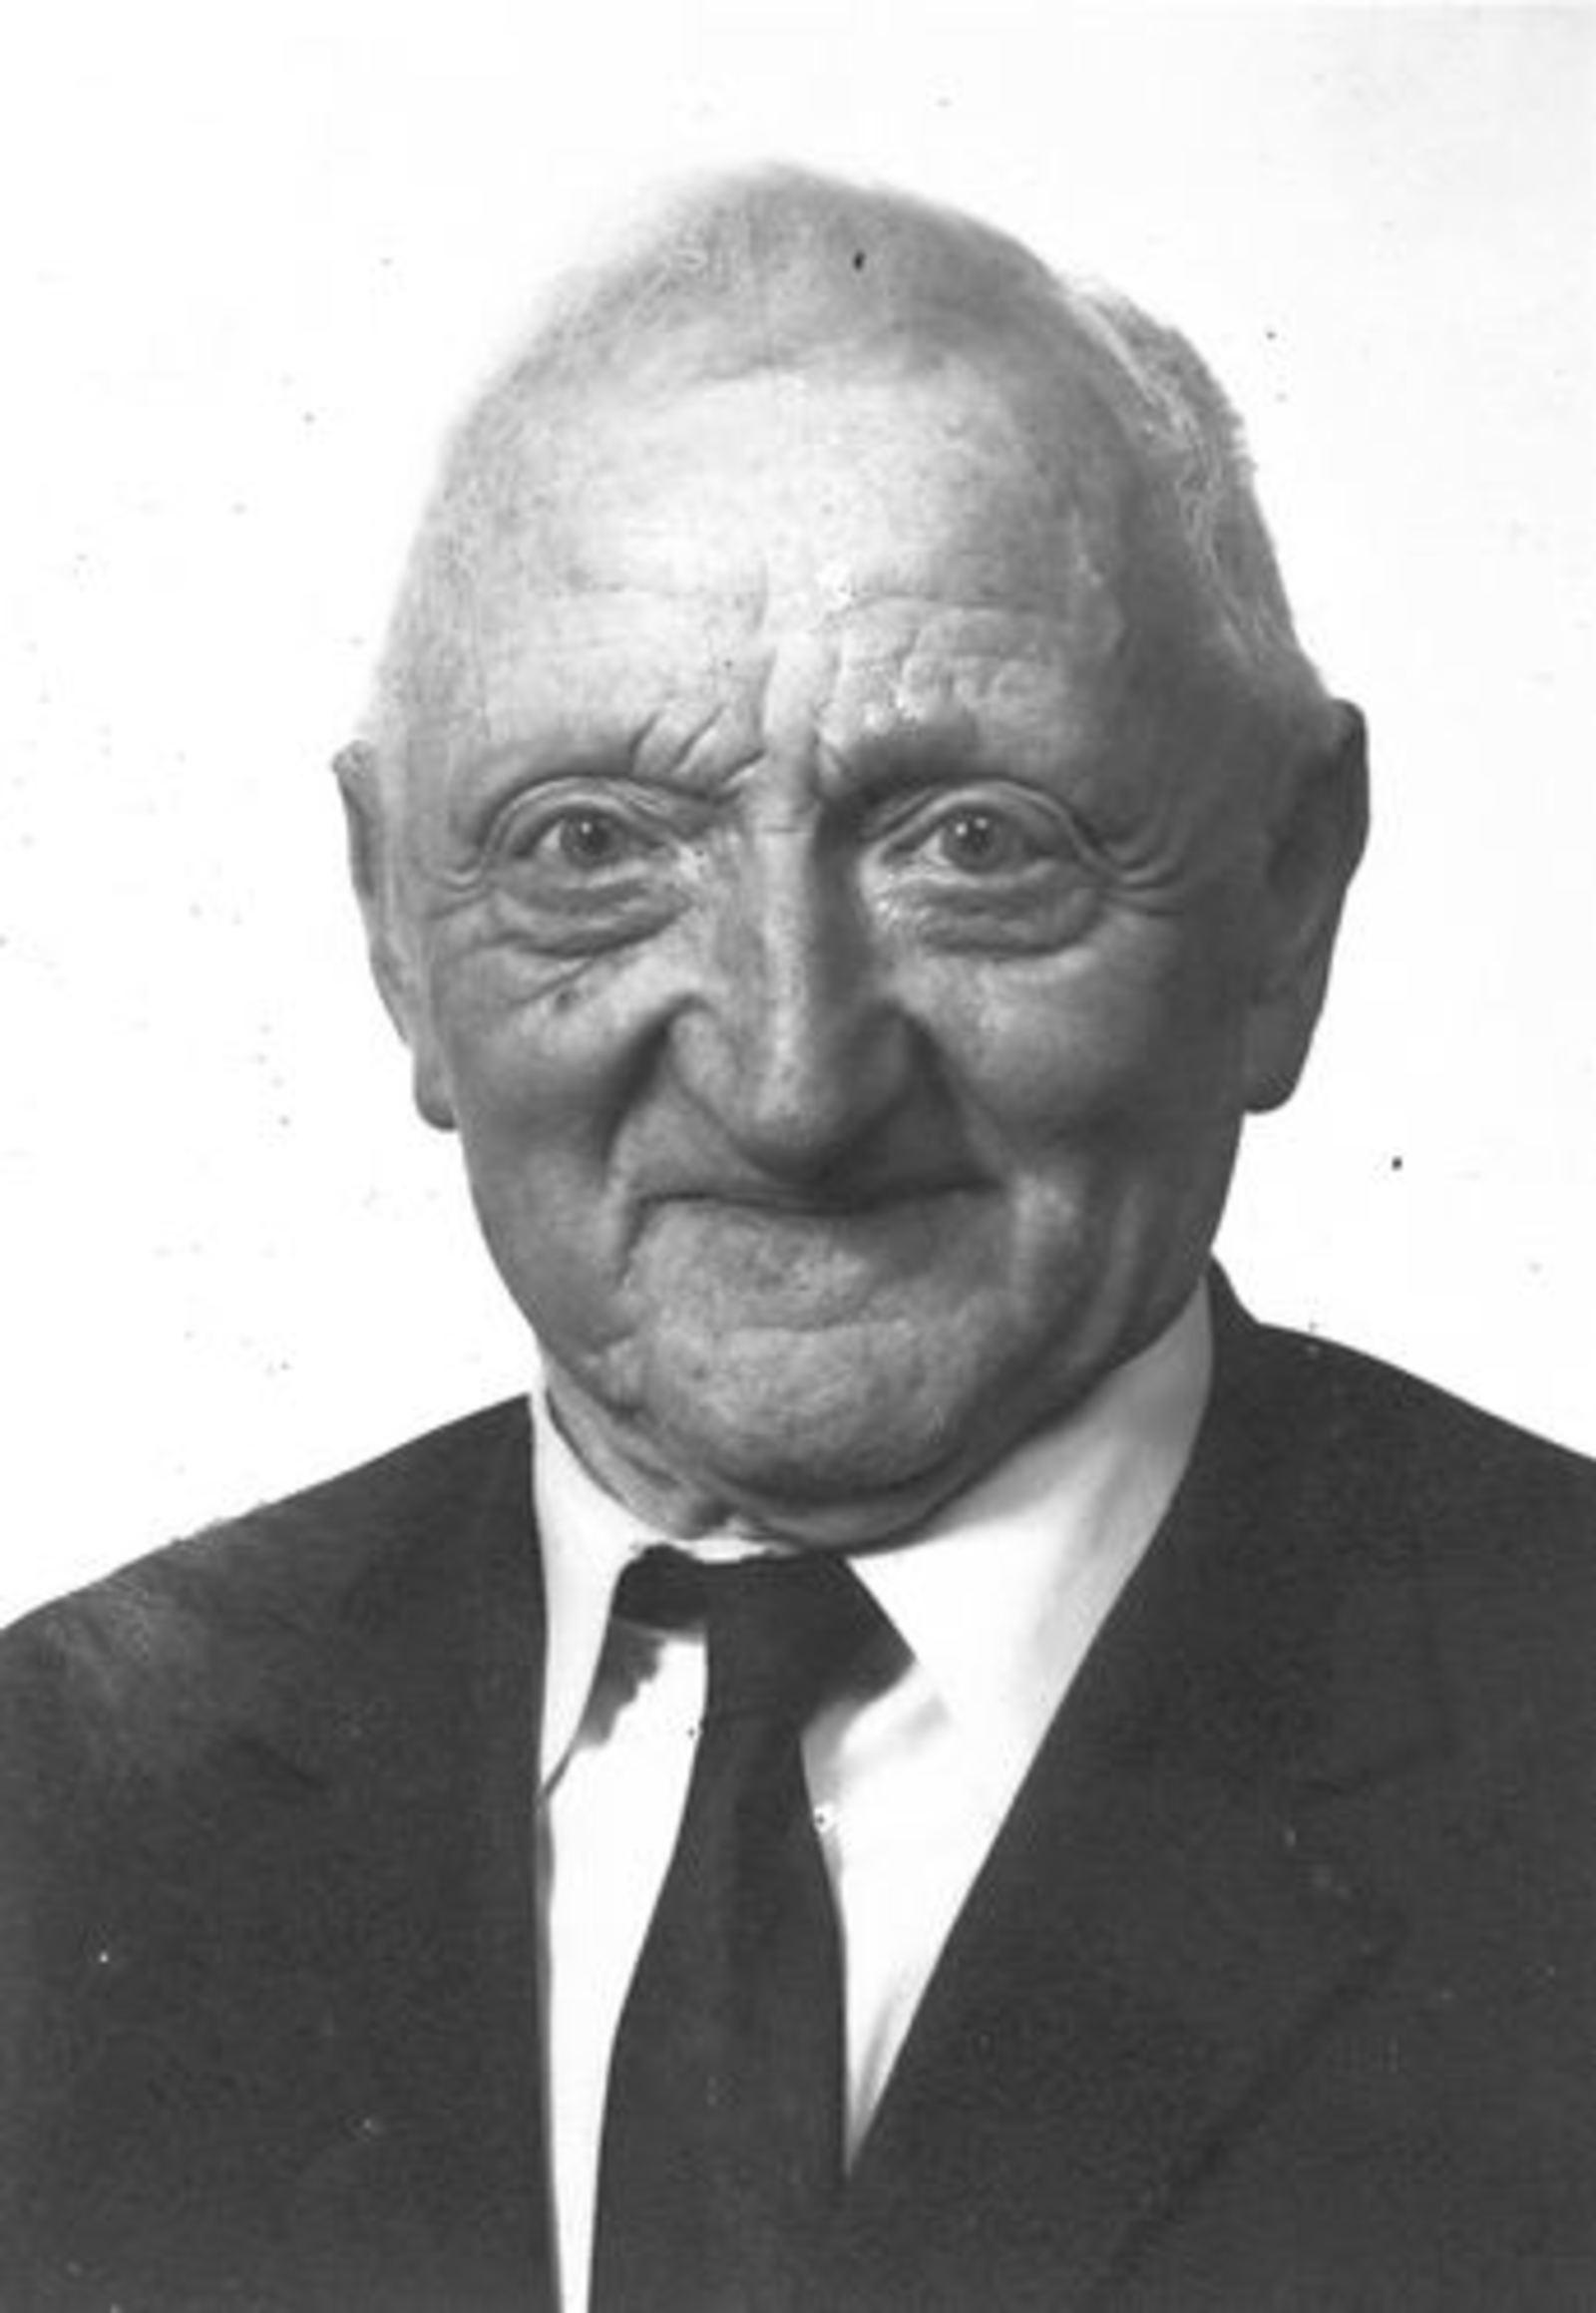 Koeckhoven Therus Janzn 1899 19__ Portret